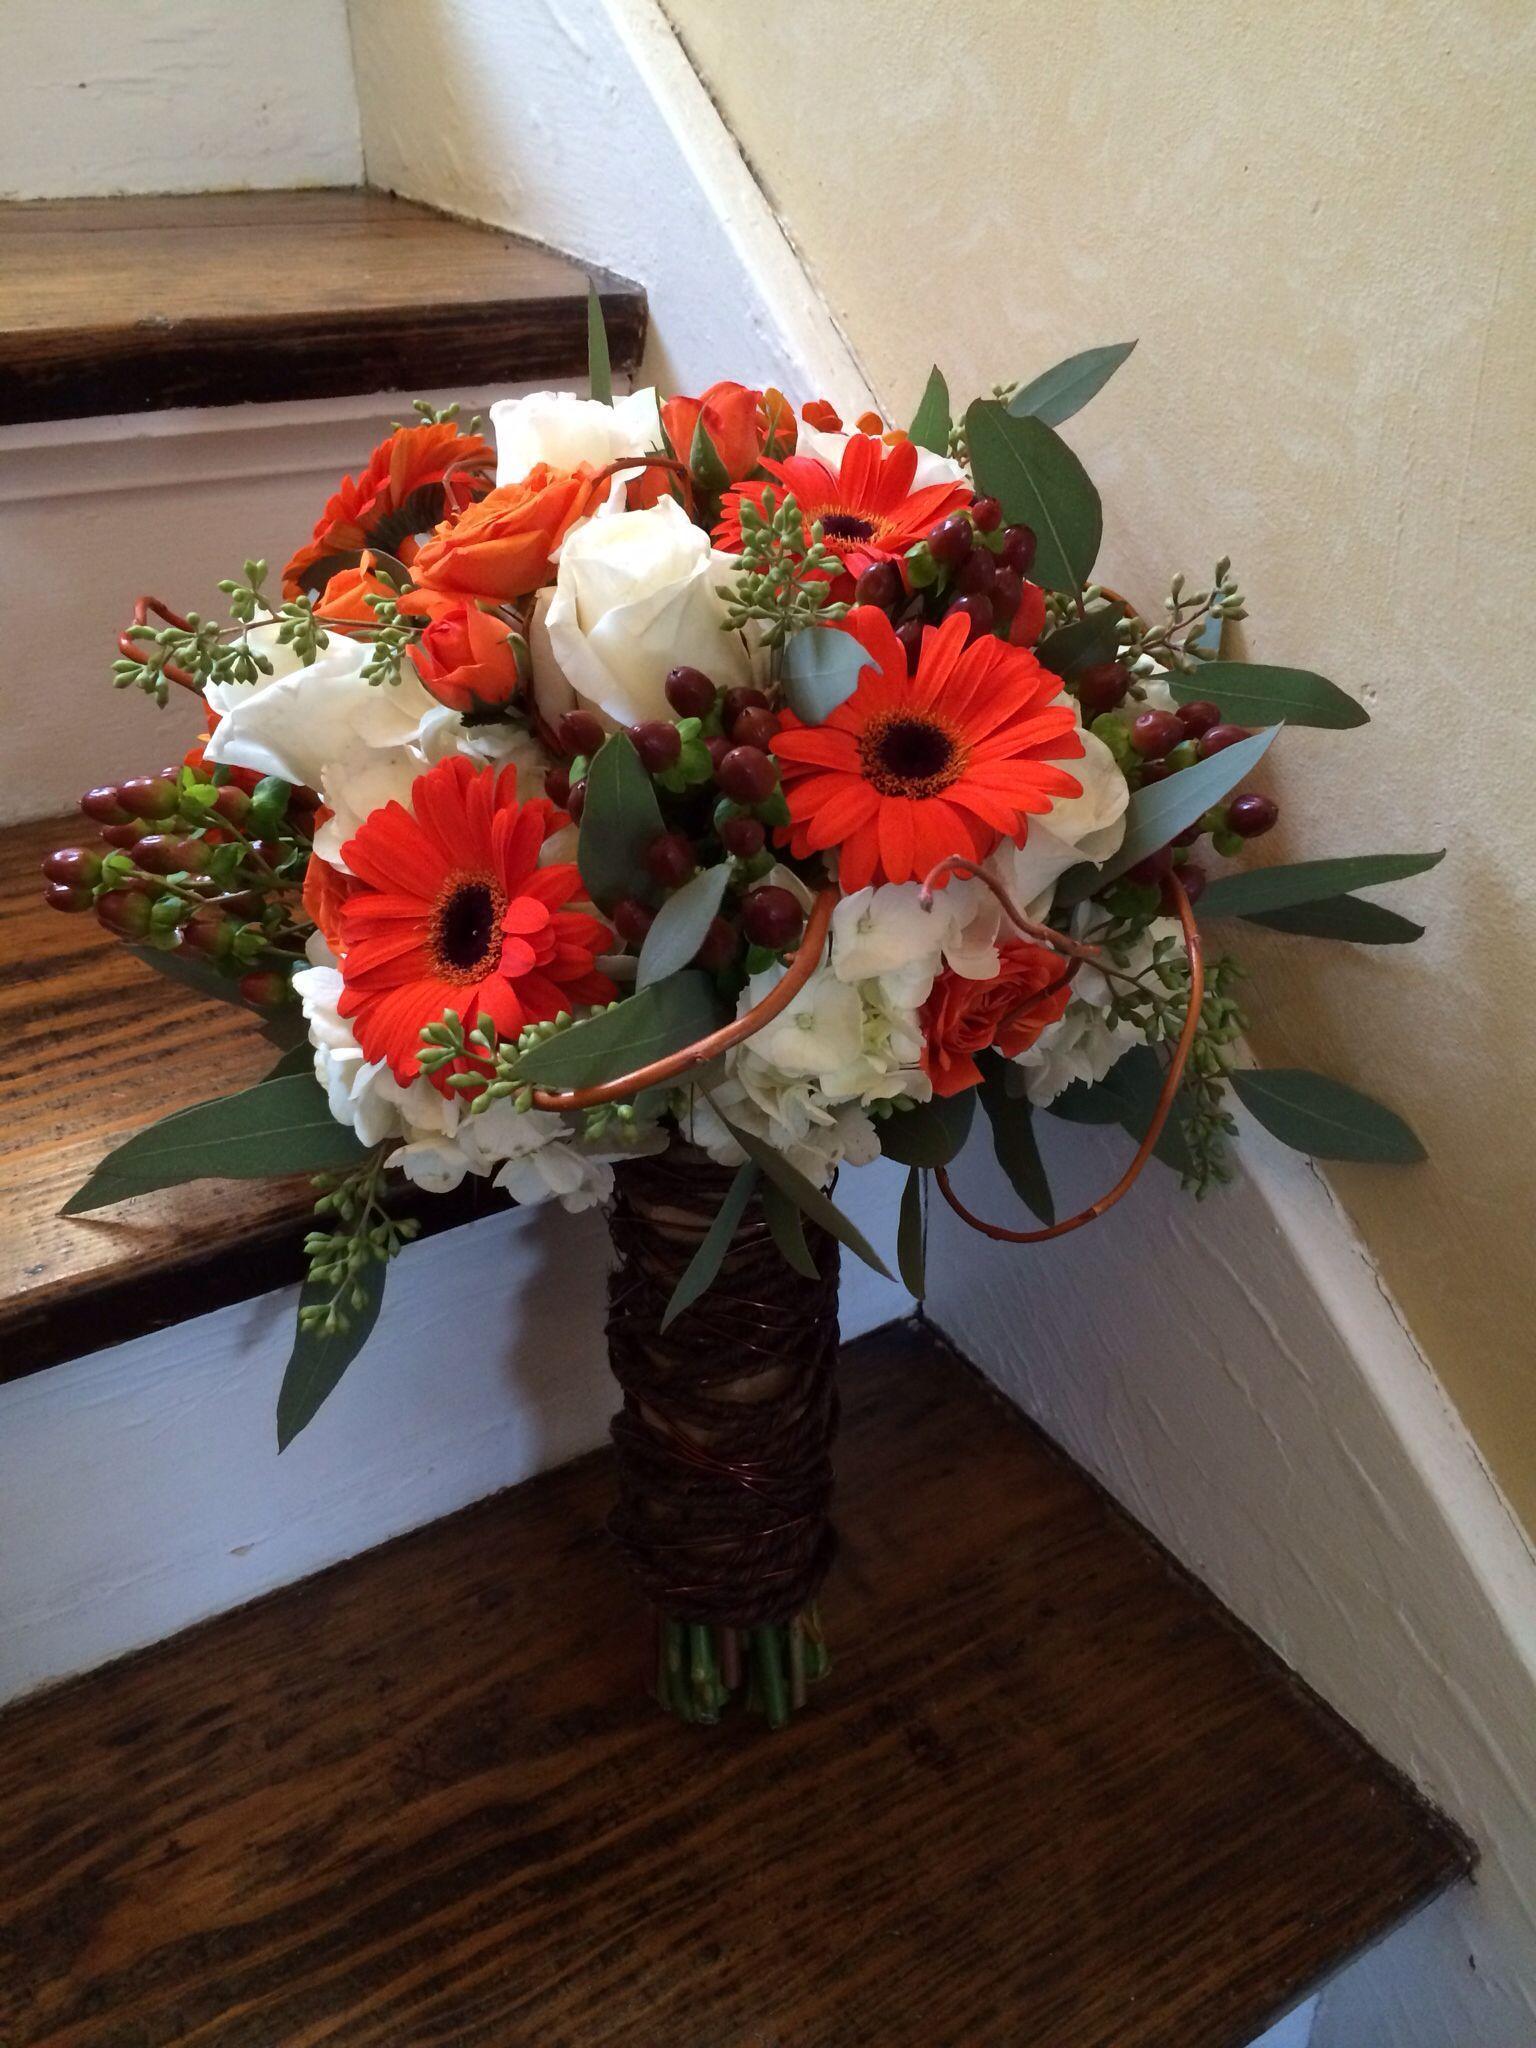 Orange and white bouquet weddingflowersdiyheadtables orange and white bouquet weddingflowersdiyheadtables weddingflowersautumn daisy wedding flowers country wedding flowers izmirmasajfo